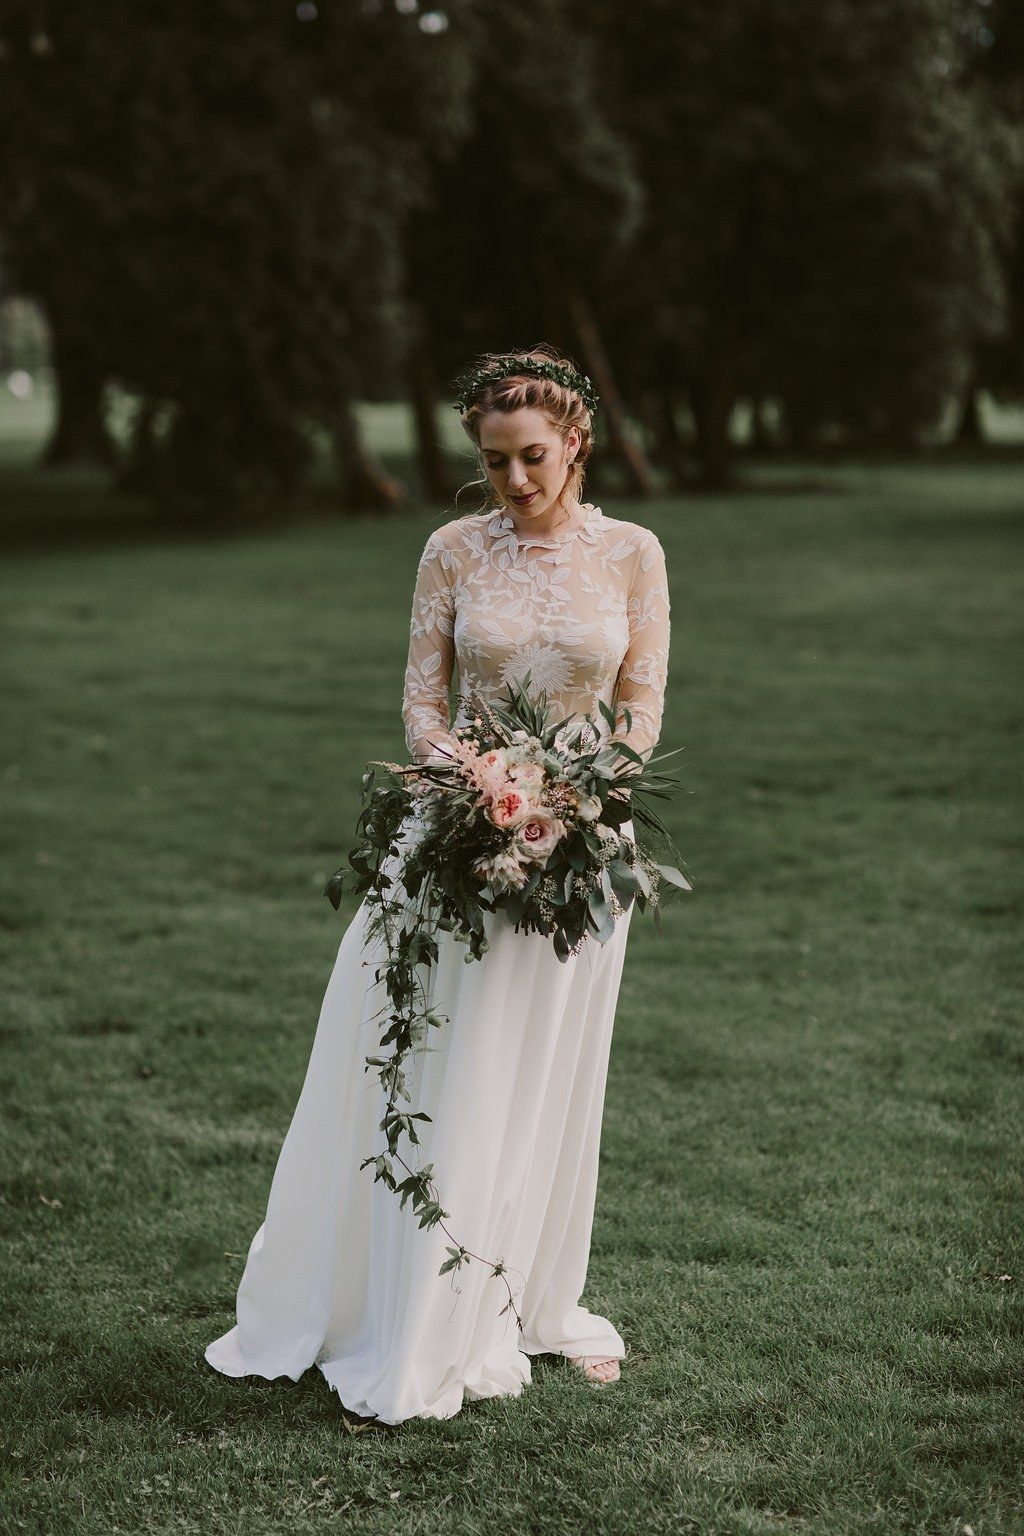 826d60673b1b 13 Real Brides in Long Sleeved Wedding Dresses | Brides | Weddings ...